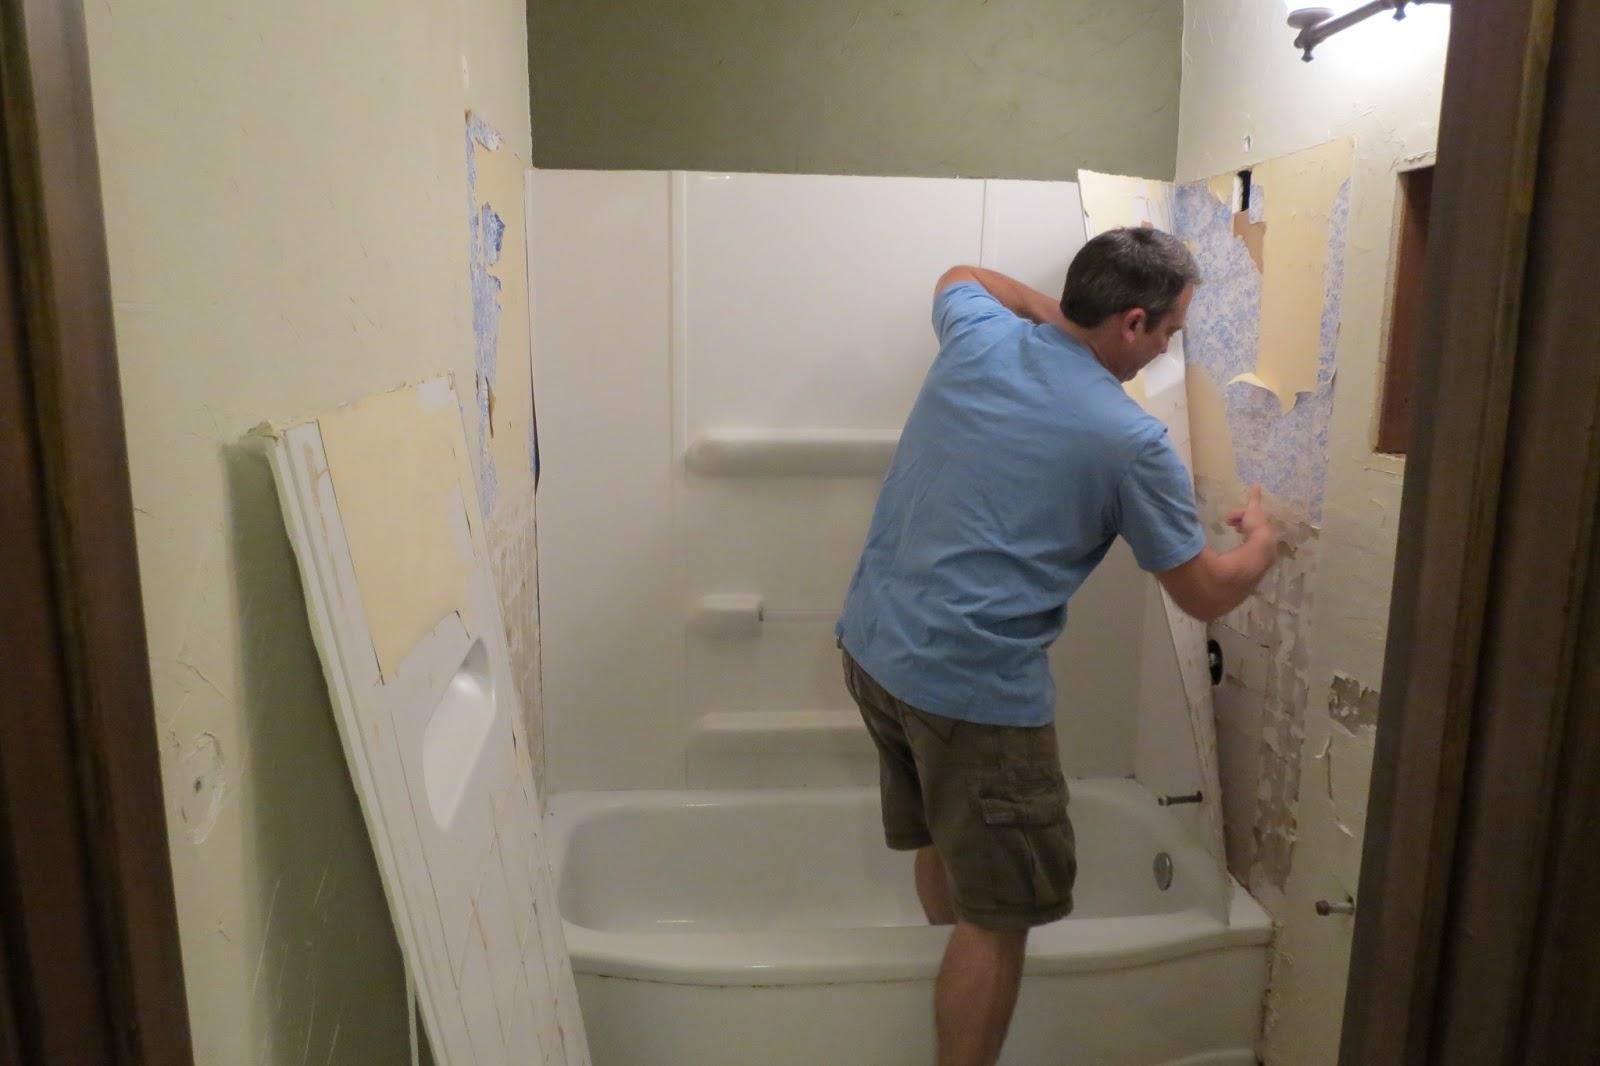 Dippity Dot: Small Bathroom Renovation